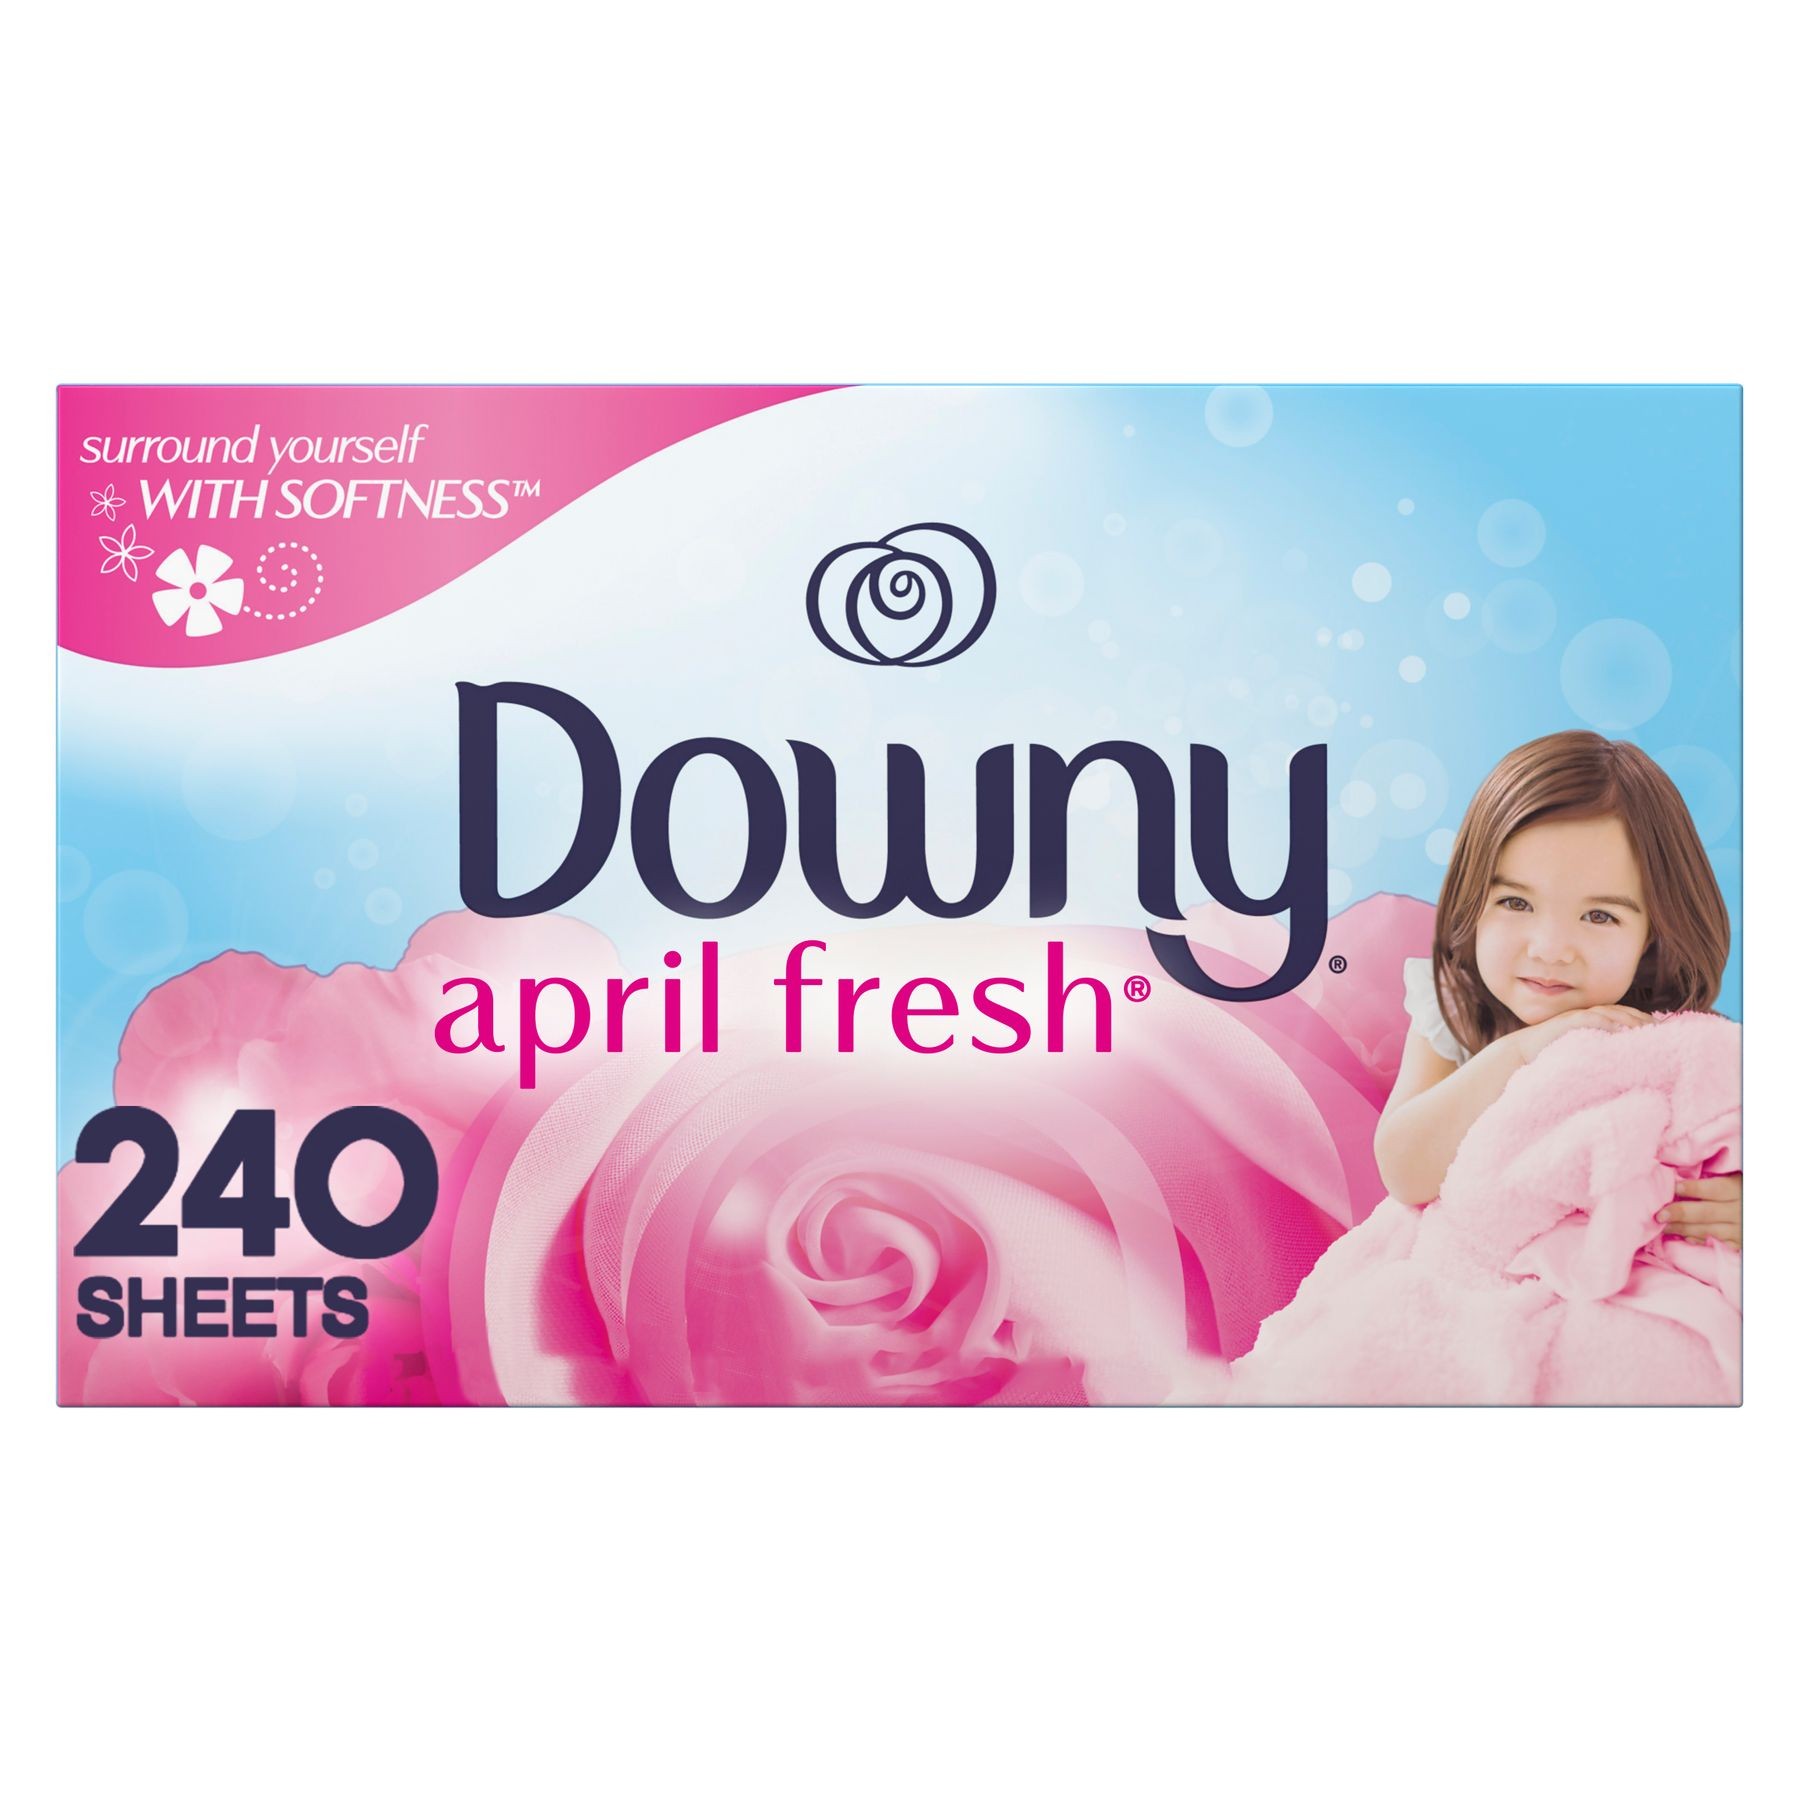 Giấy thơm quần áo Downy